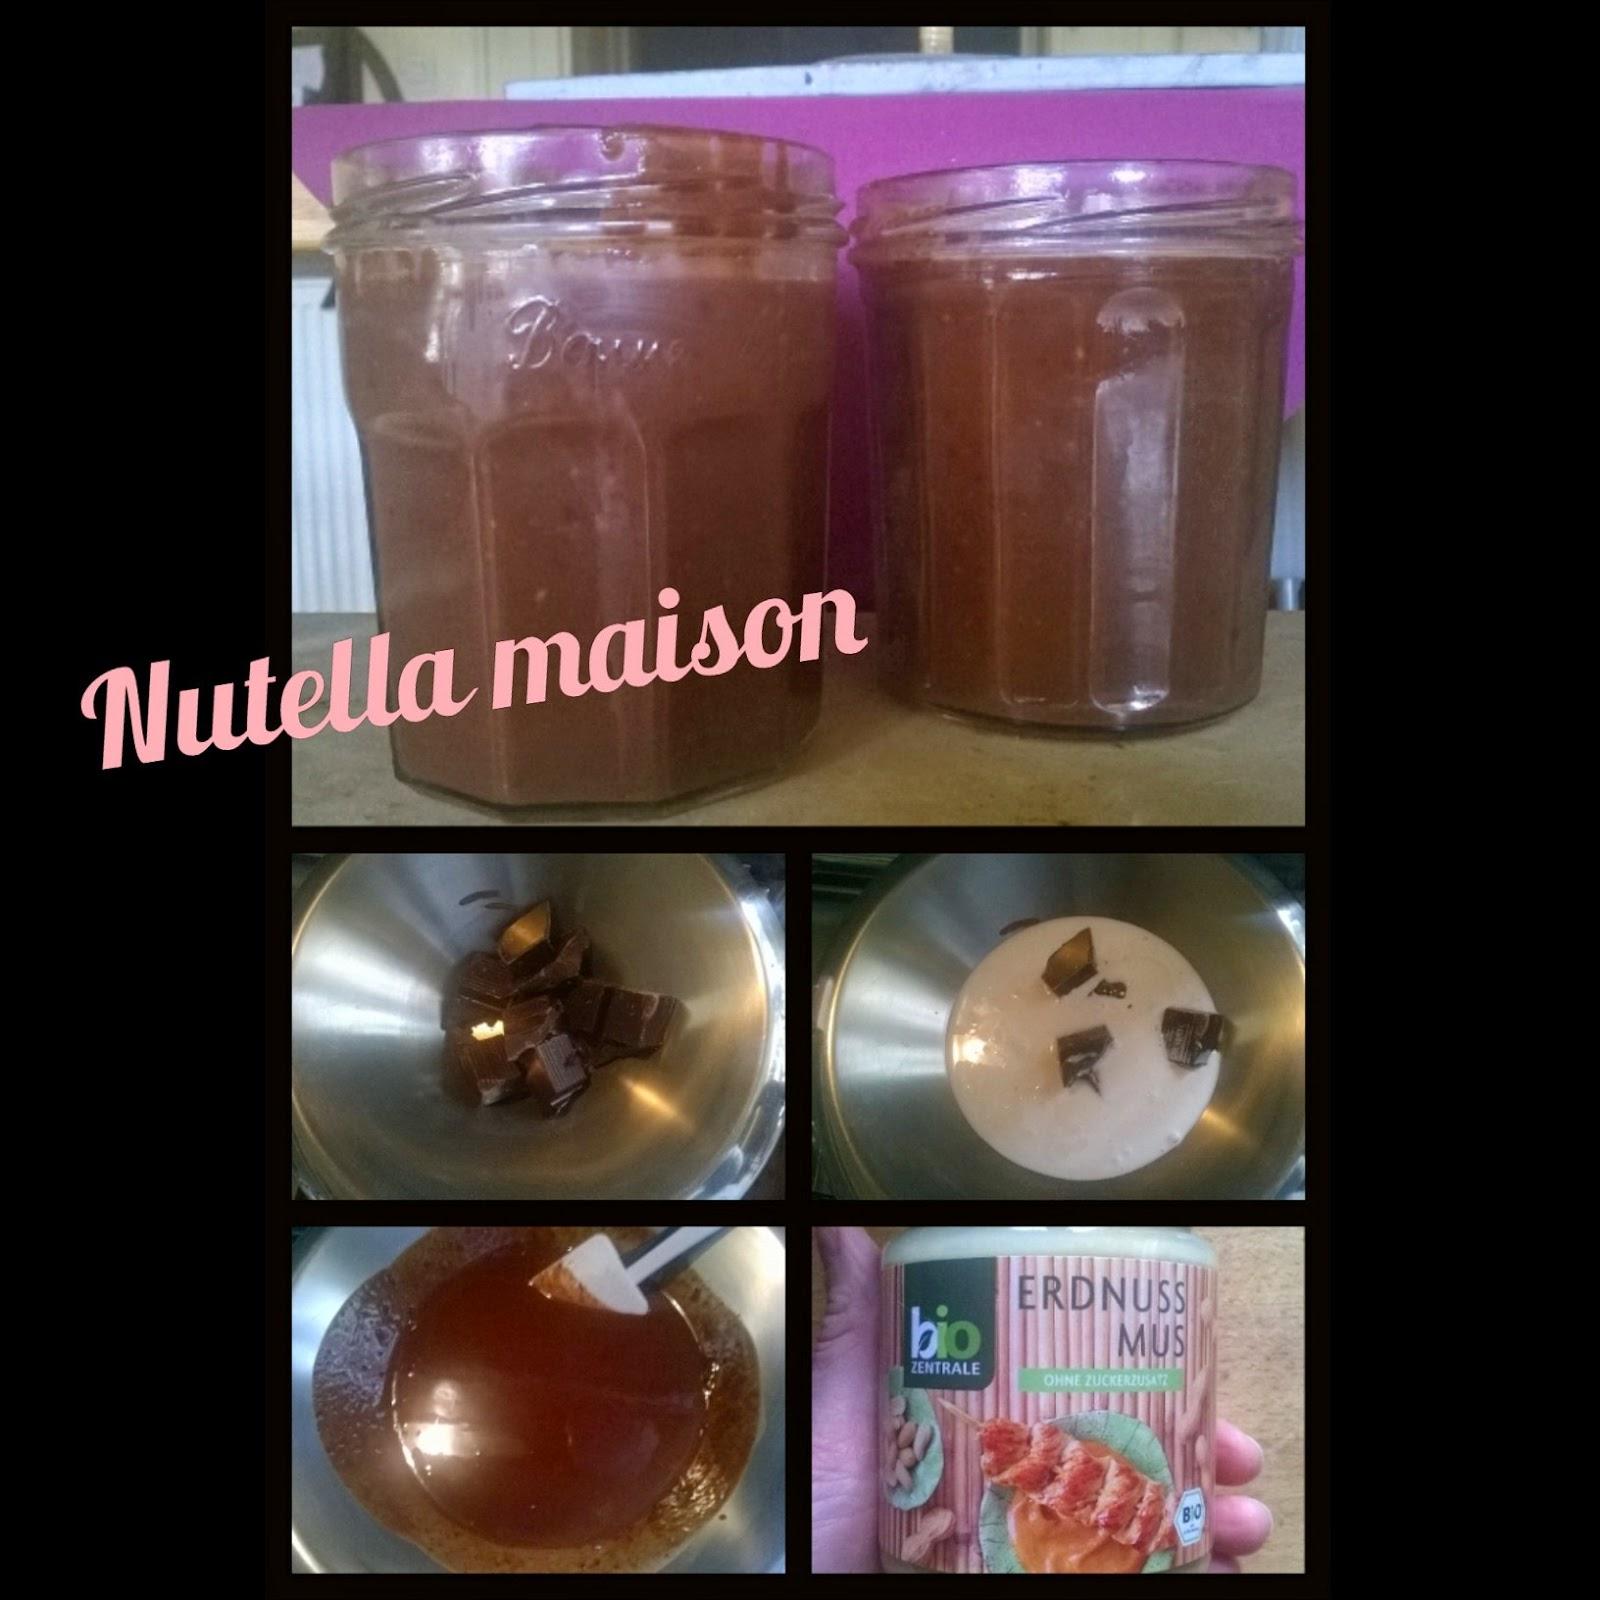 http://www.petitesastucesentrefilles.com/2015/02/nutella-maison-nouvelle-version.html